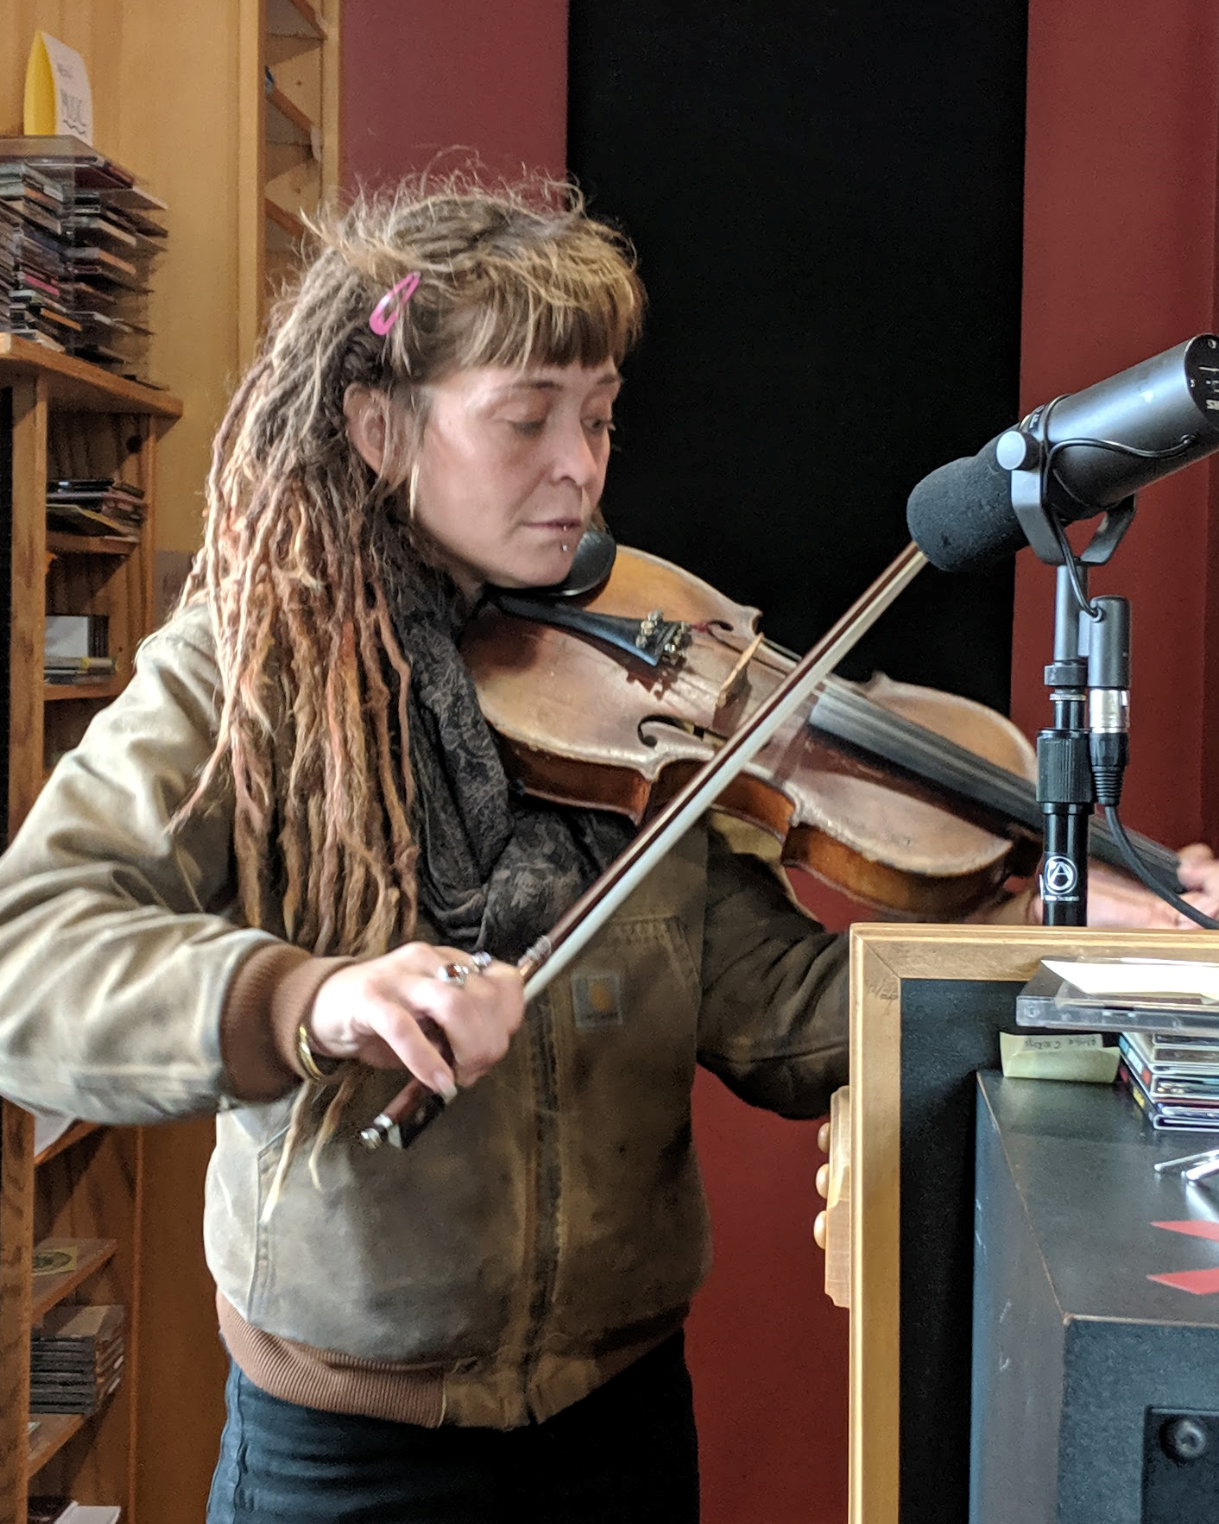 Abigail Arrowsmith fiddles on Scenic Route